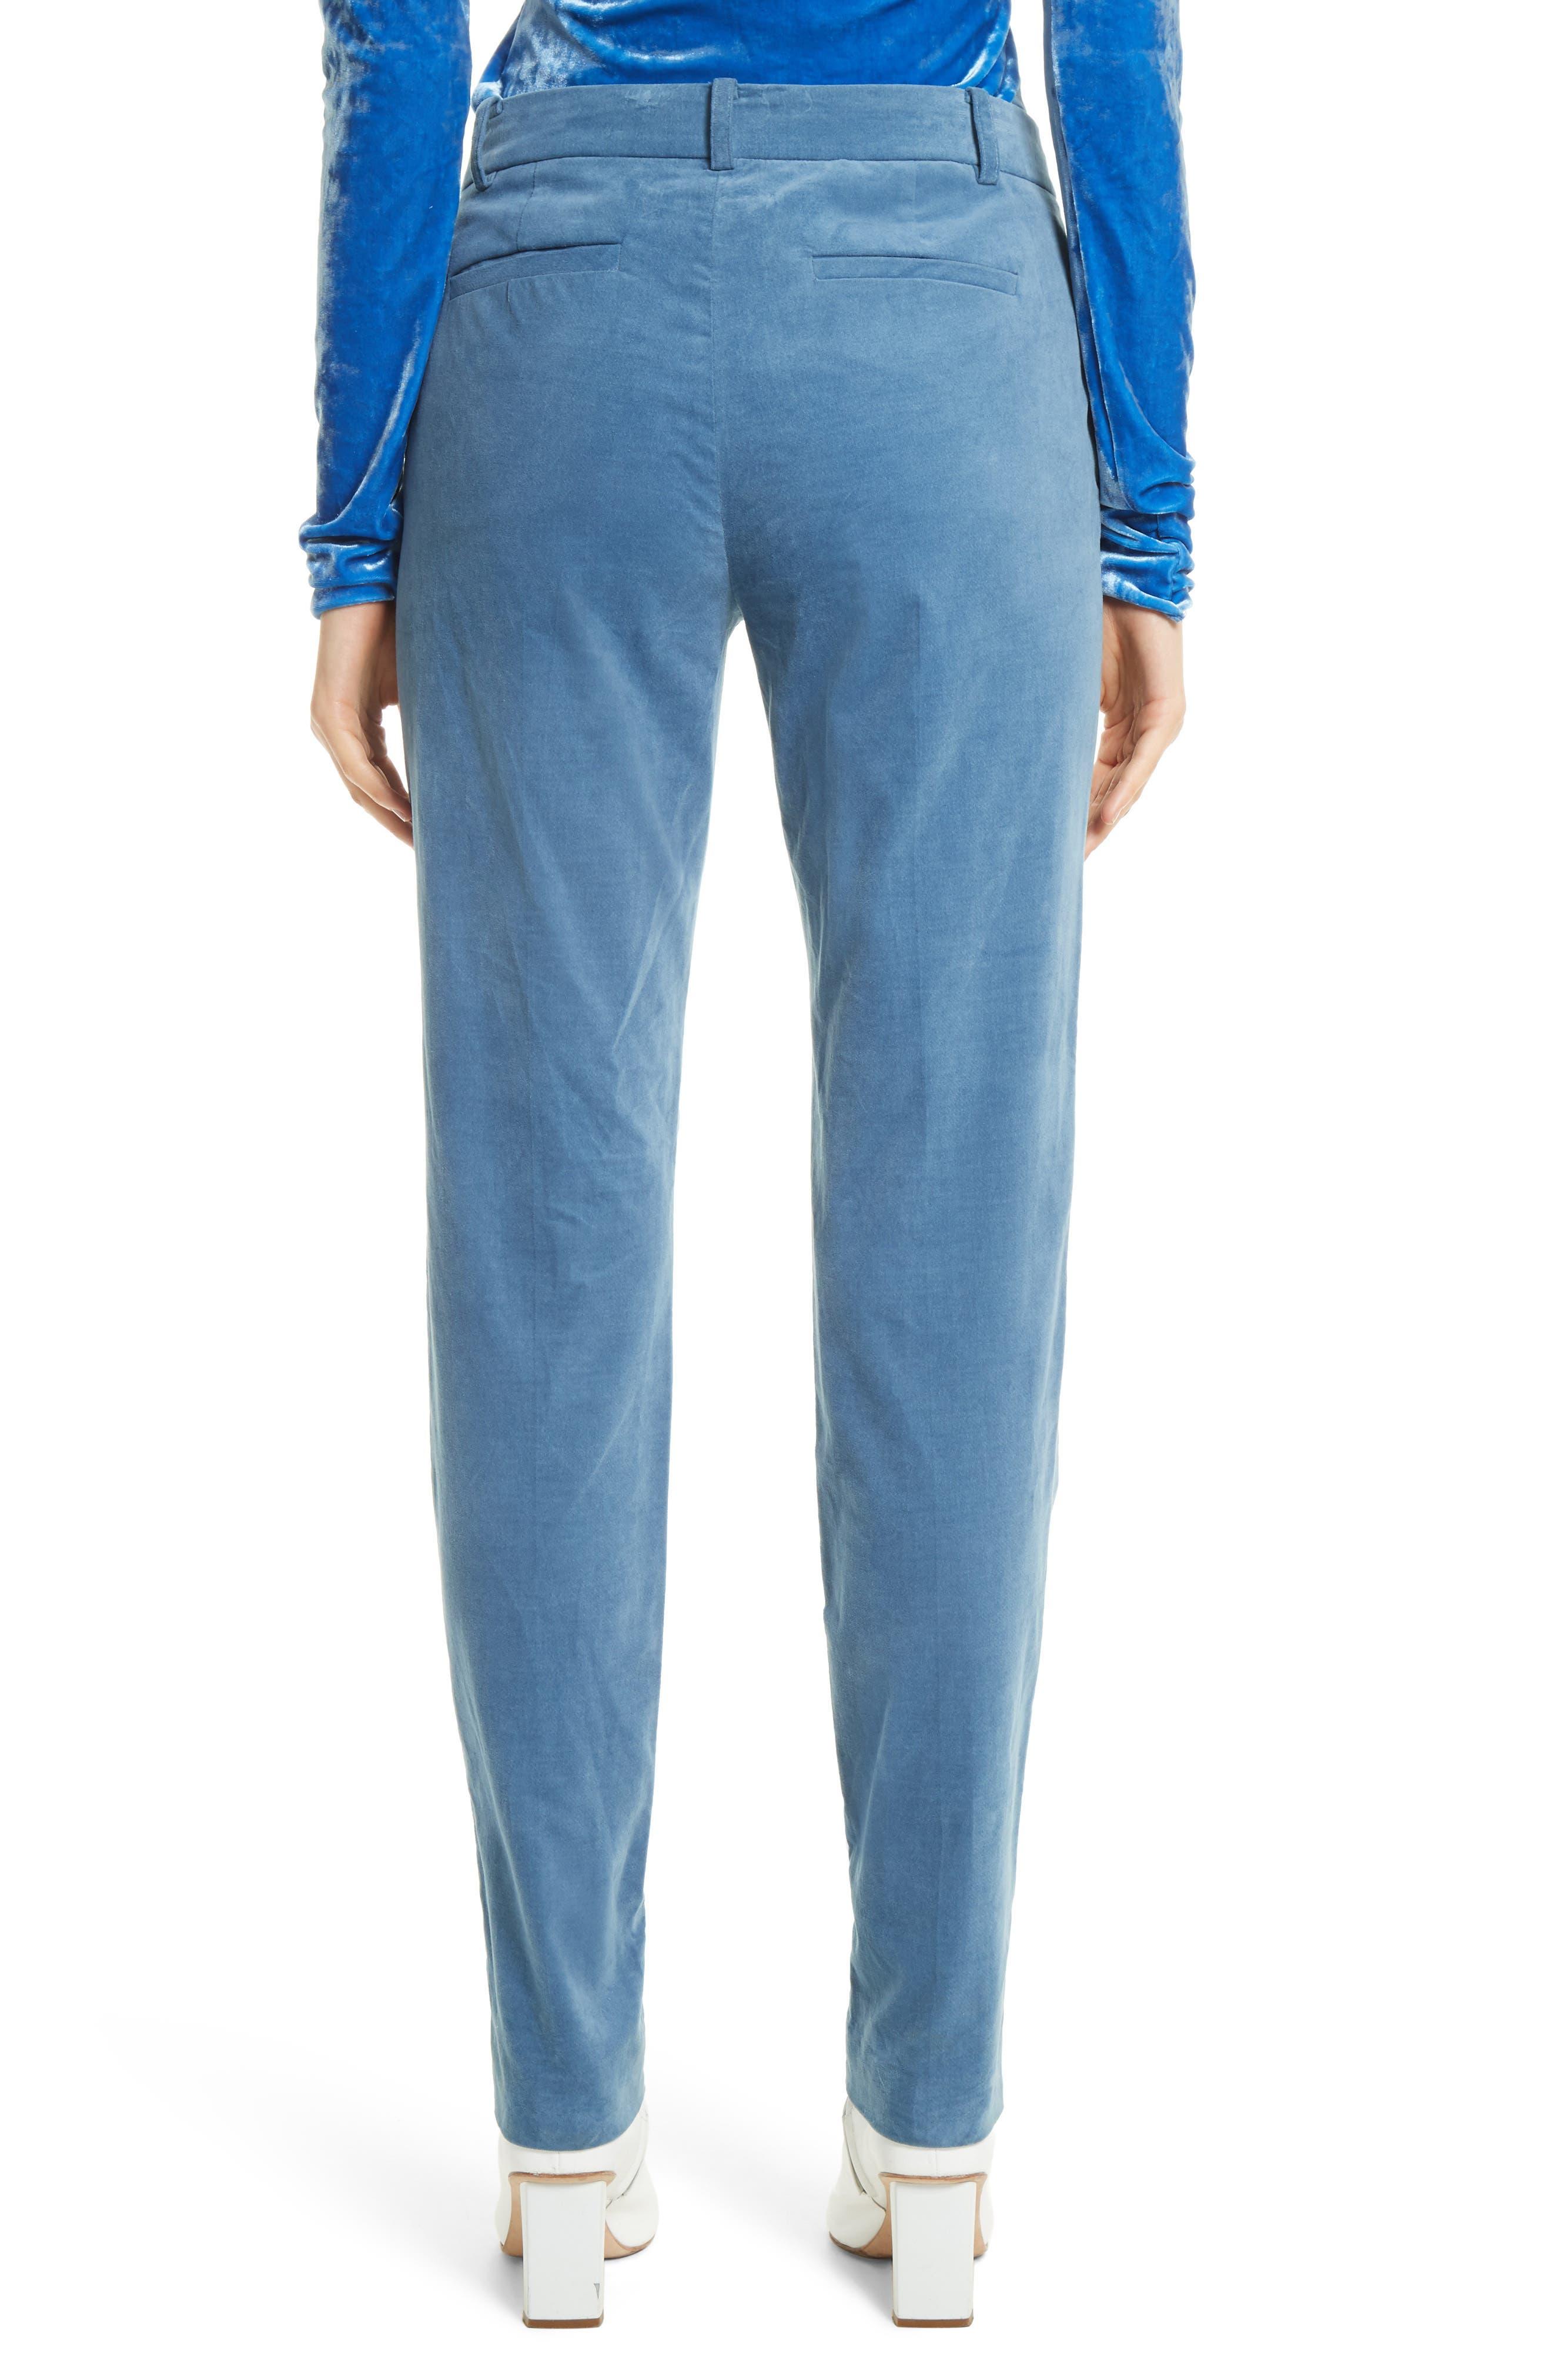 Moleskin Stretch Cotton Skinny Pants,                             Alternate thumbnail 2, color,                             400